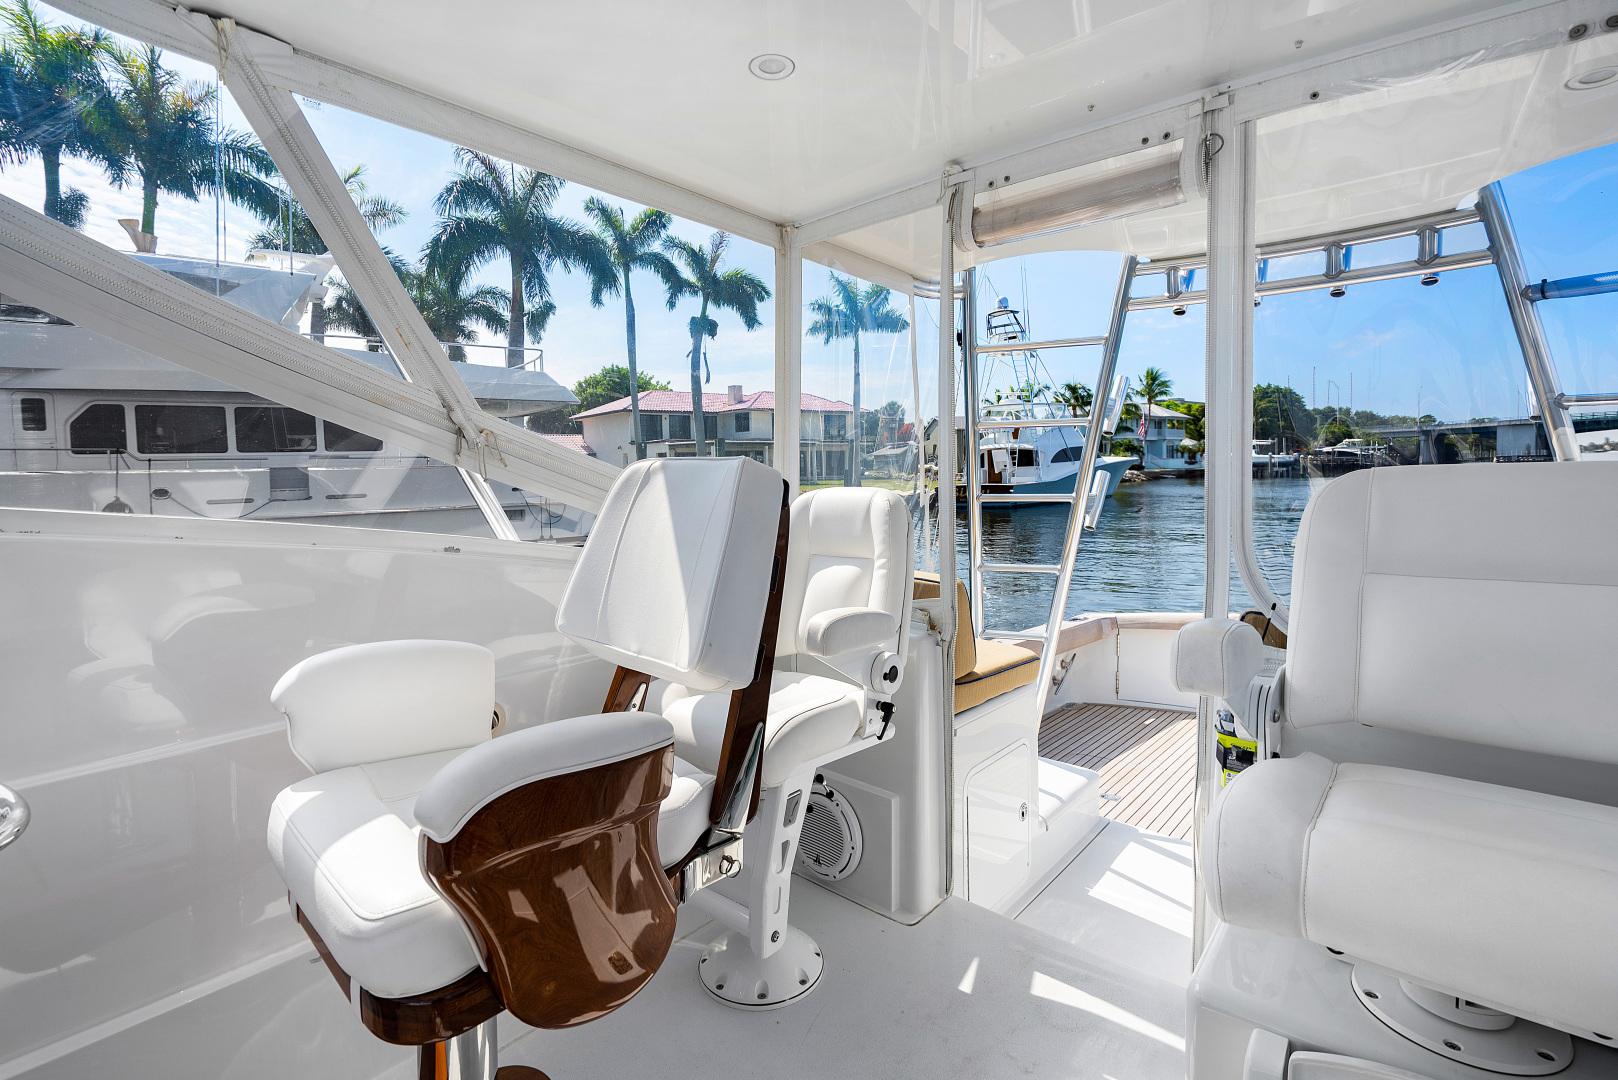 Release-Walkaround 2014-De Bowat Palm Beach Gardens-United States-1364495 | Thumbnail